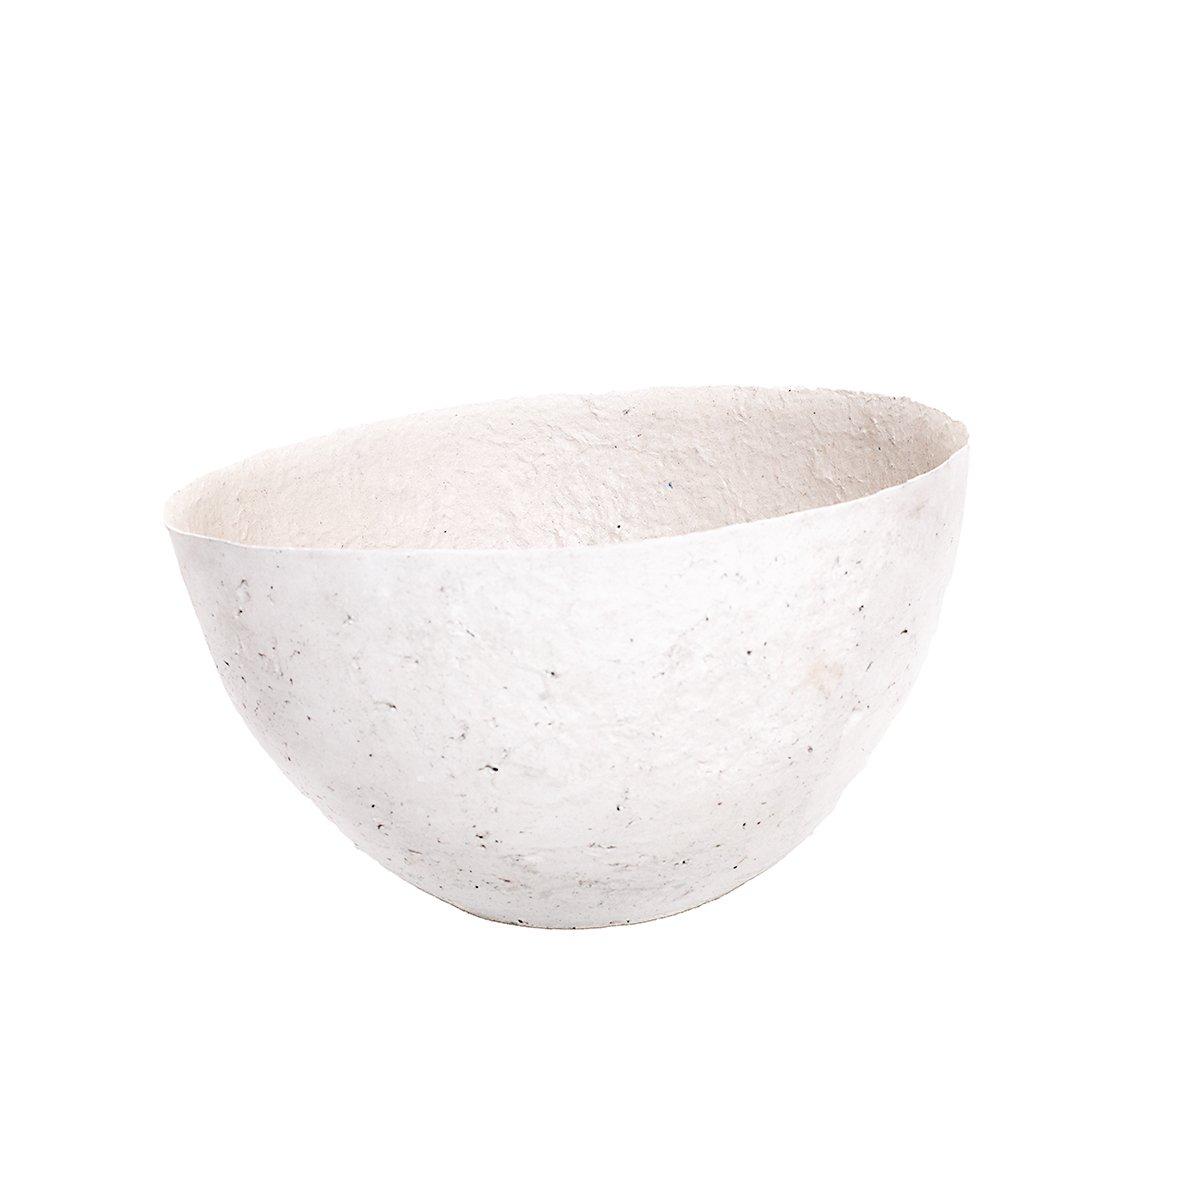 Large_pulp_bowl6_2048x.jpg